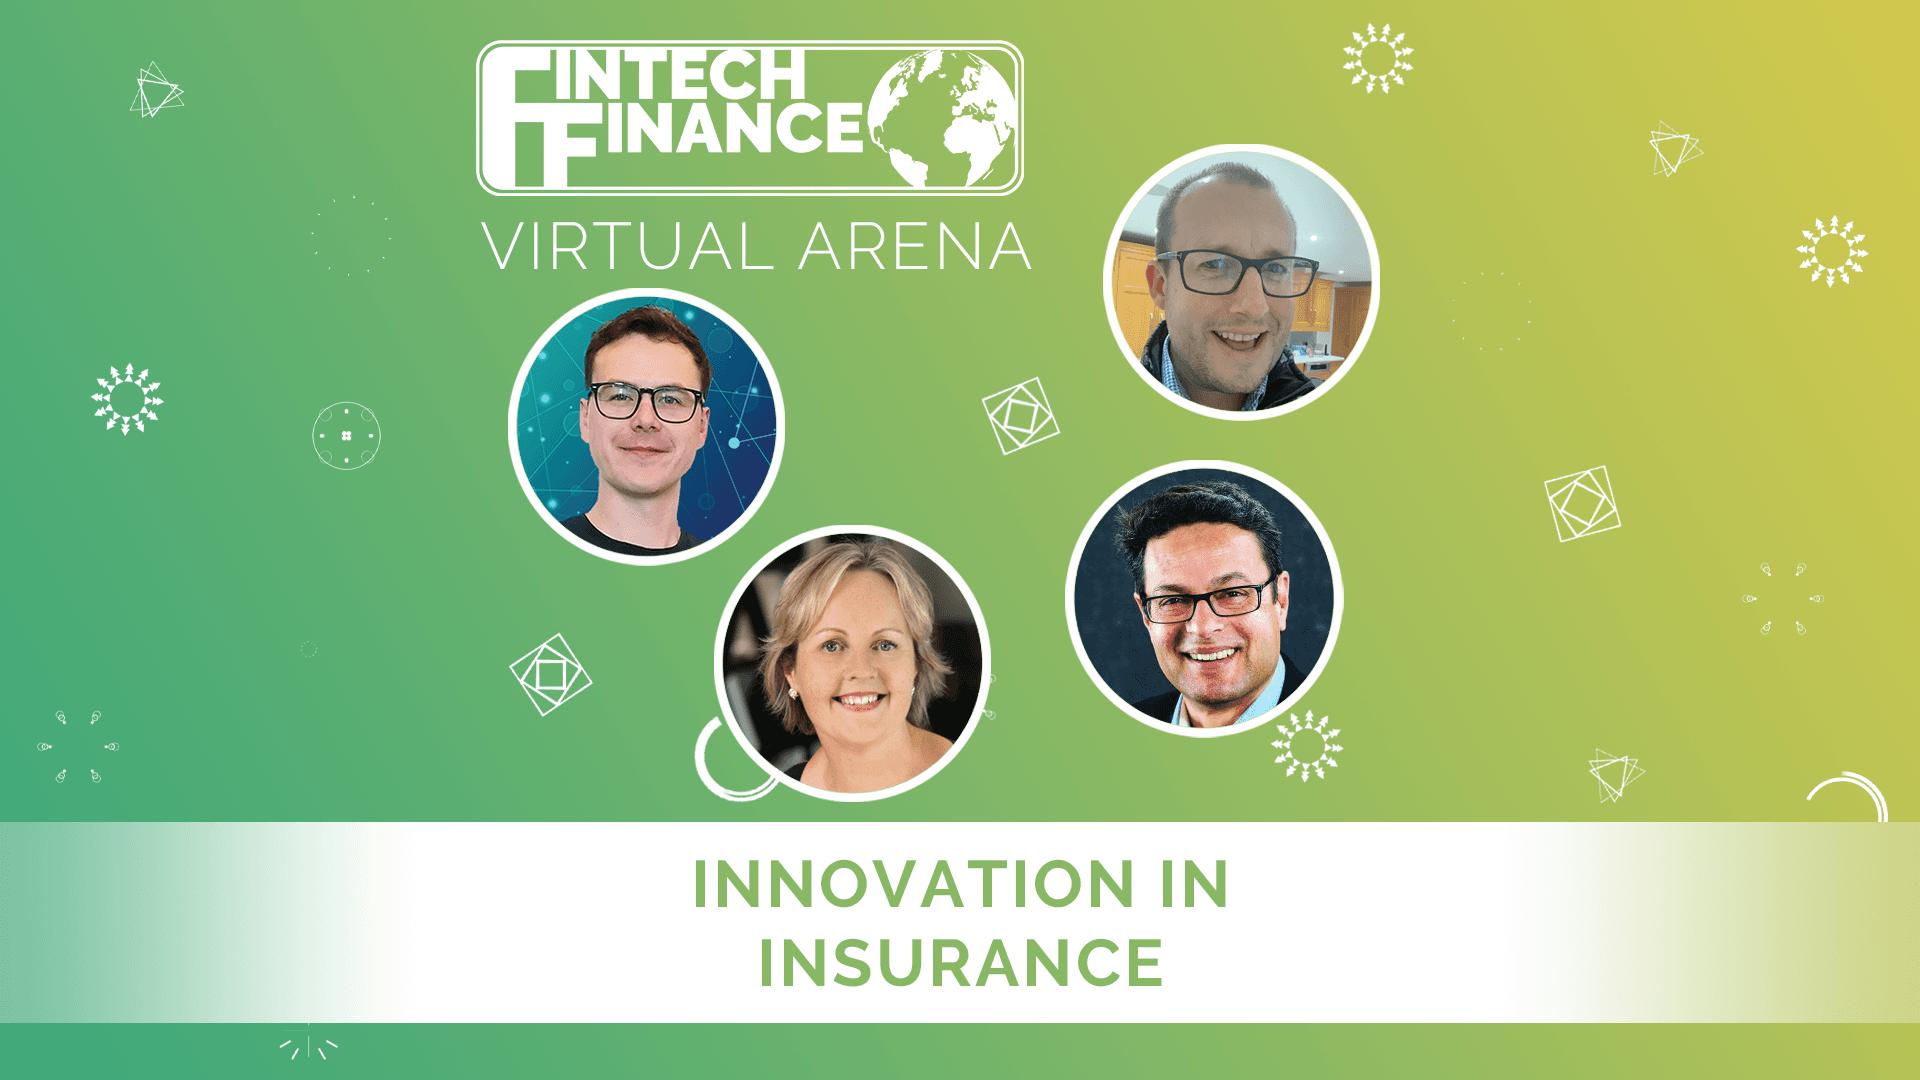 Fintech Finance Virtual Arena: Innovation in Insurance